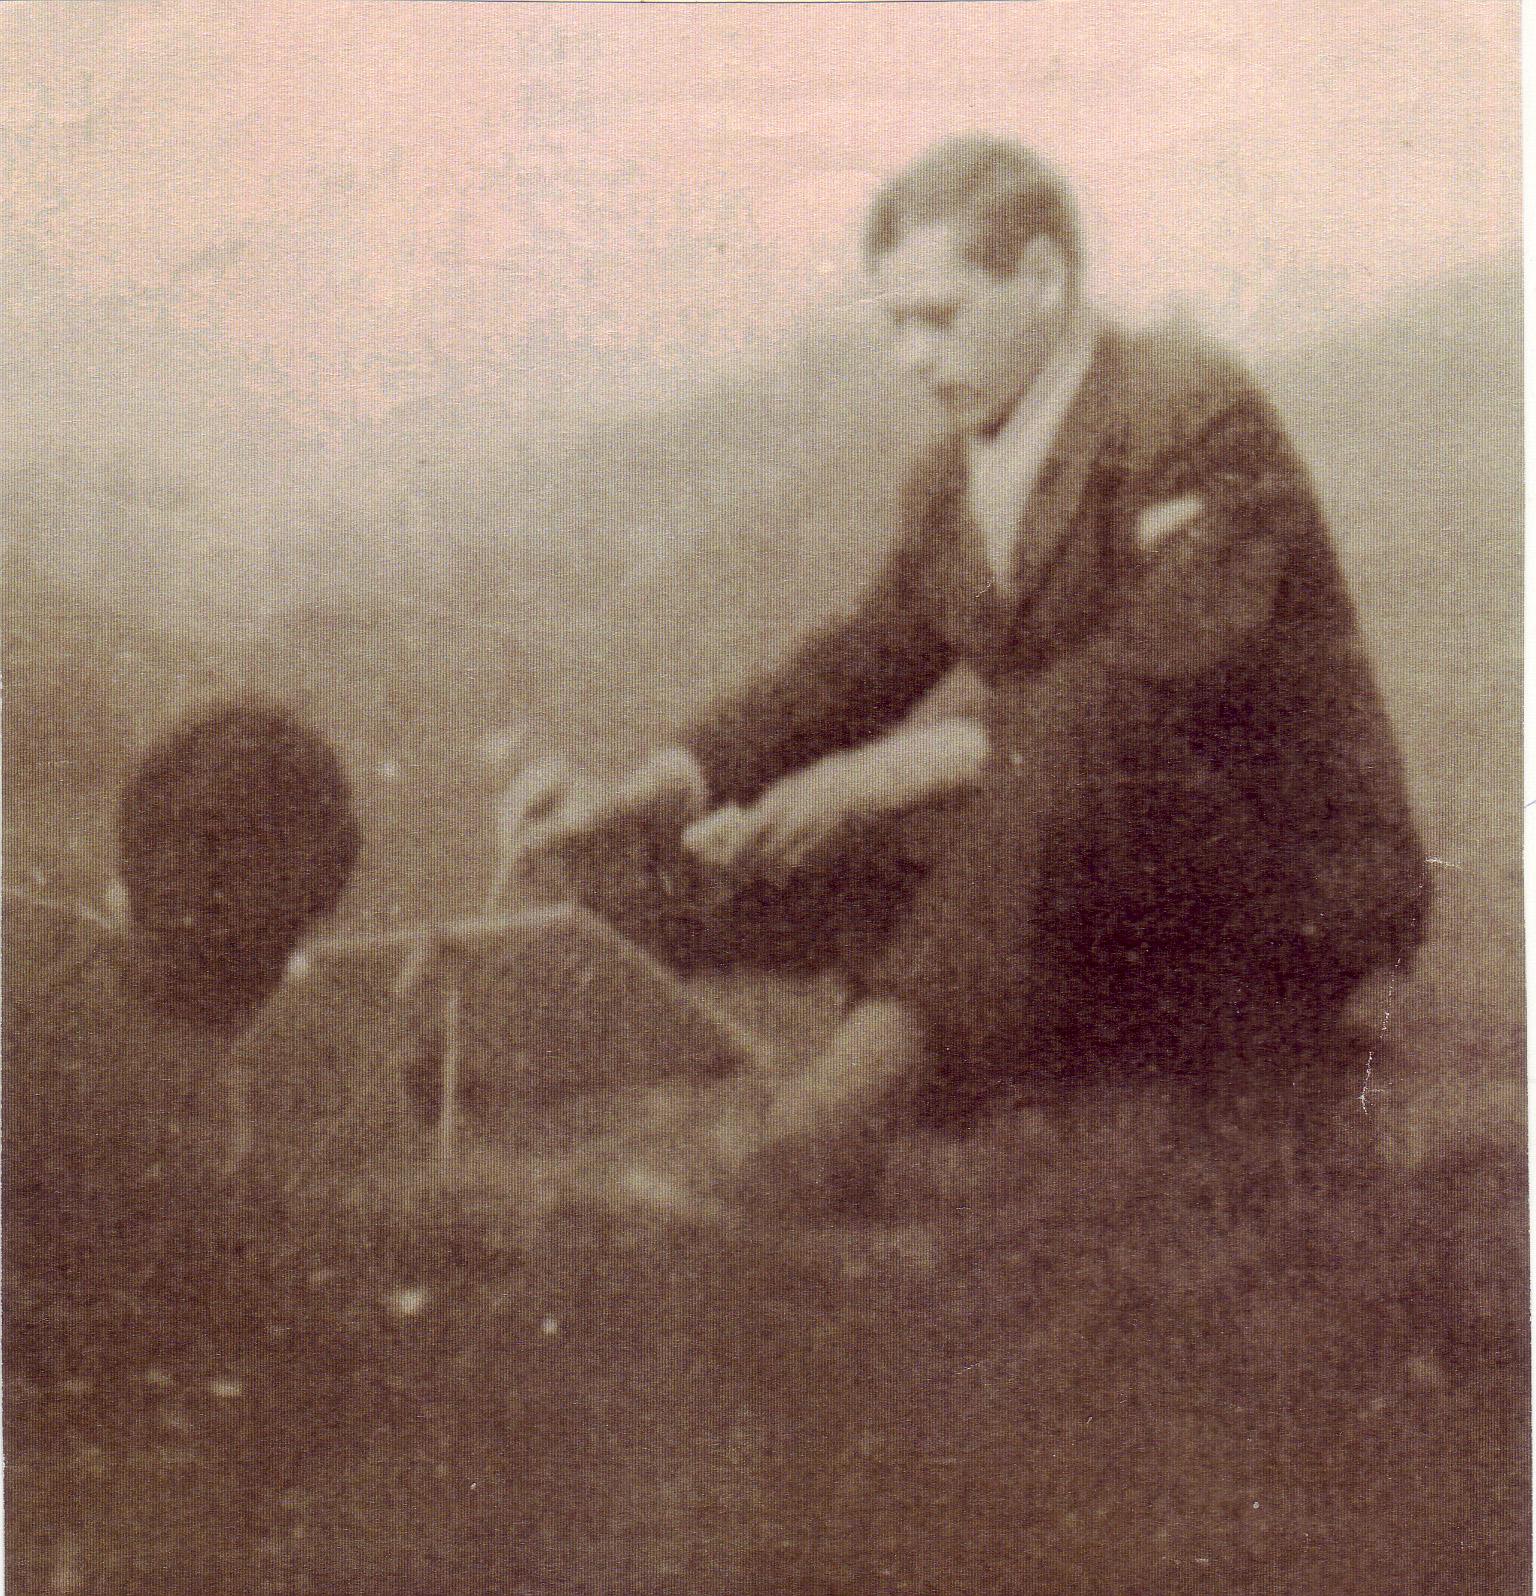 Simion Petre Cichirdan pe Capela, pictand, foto Mircea Vasile colecţia C. Poenaru, 1964